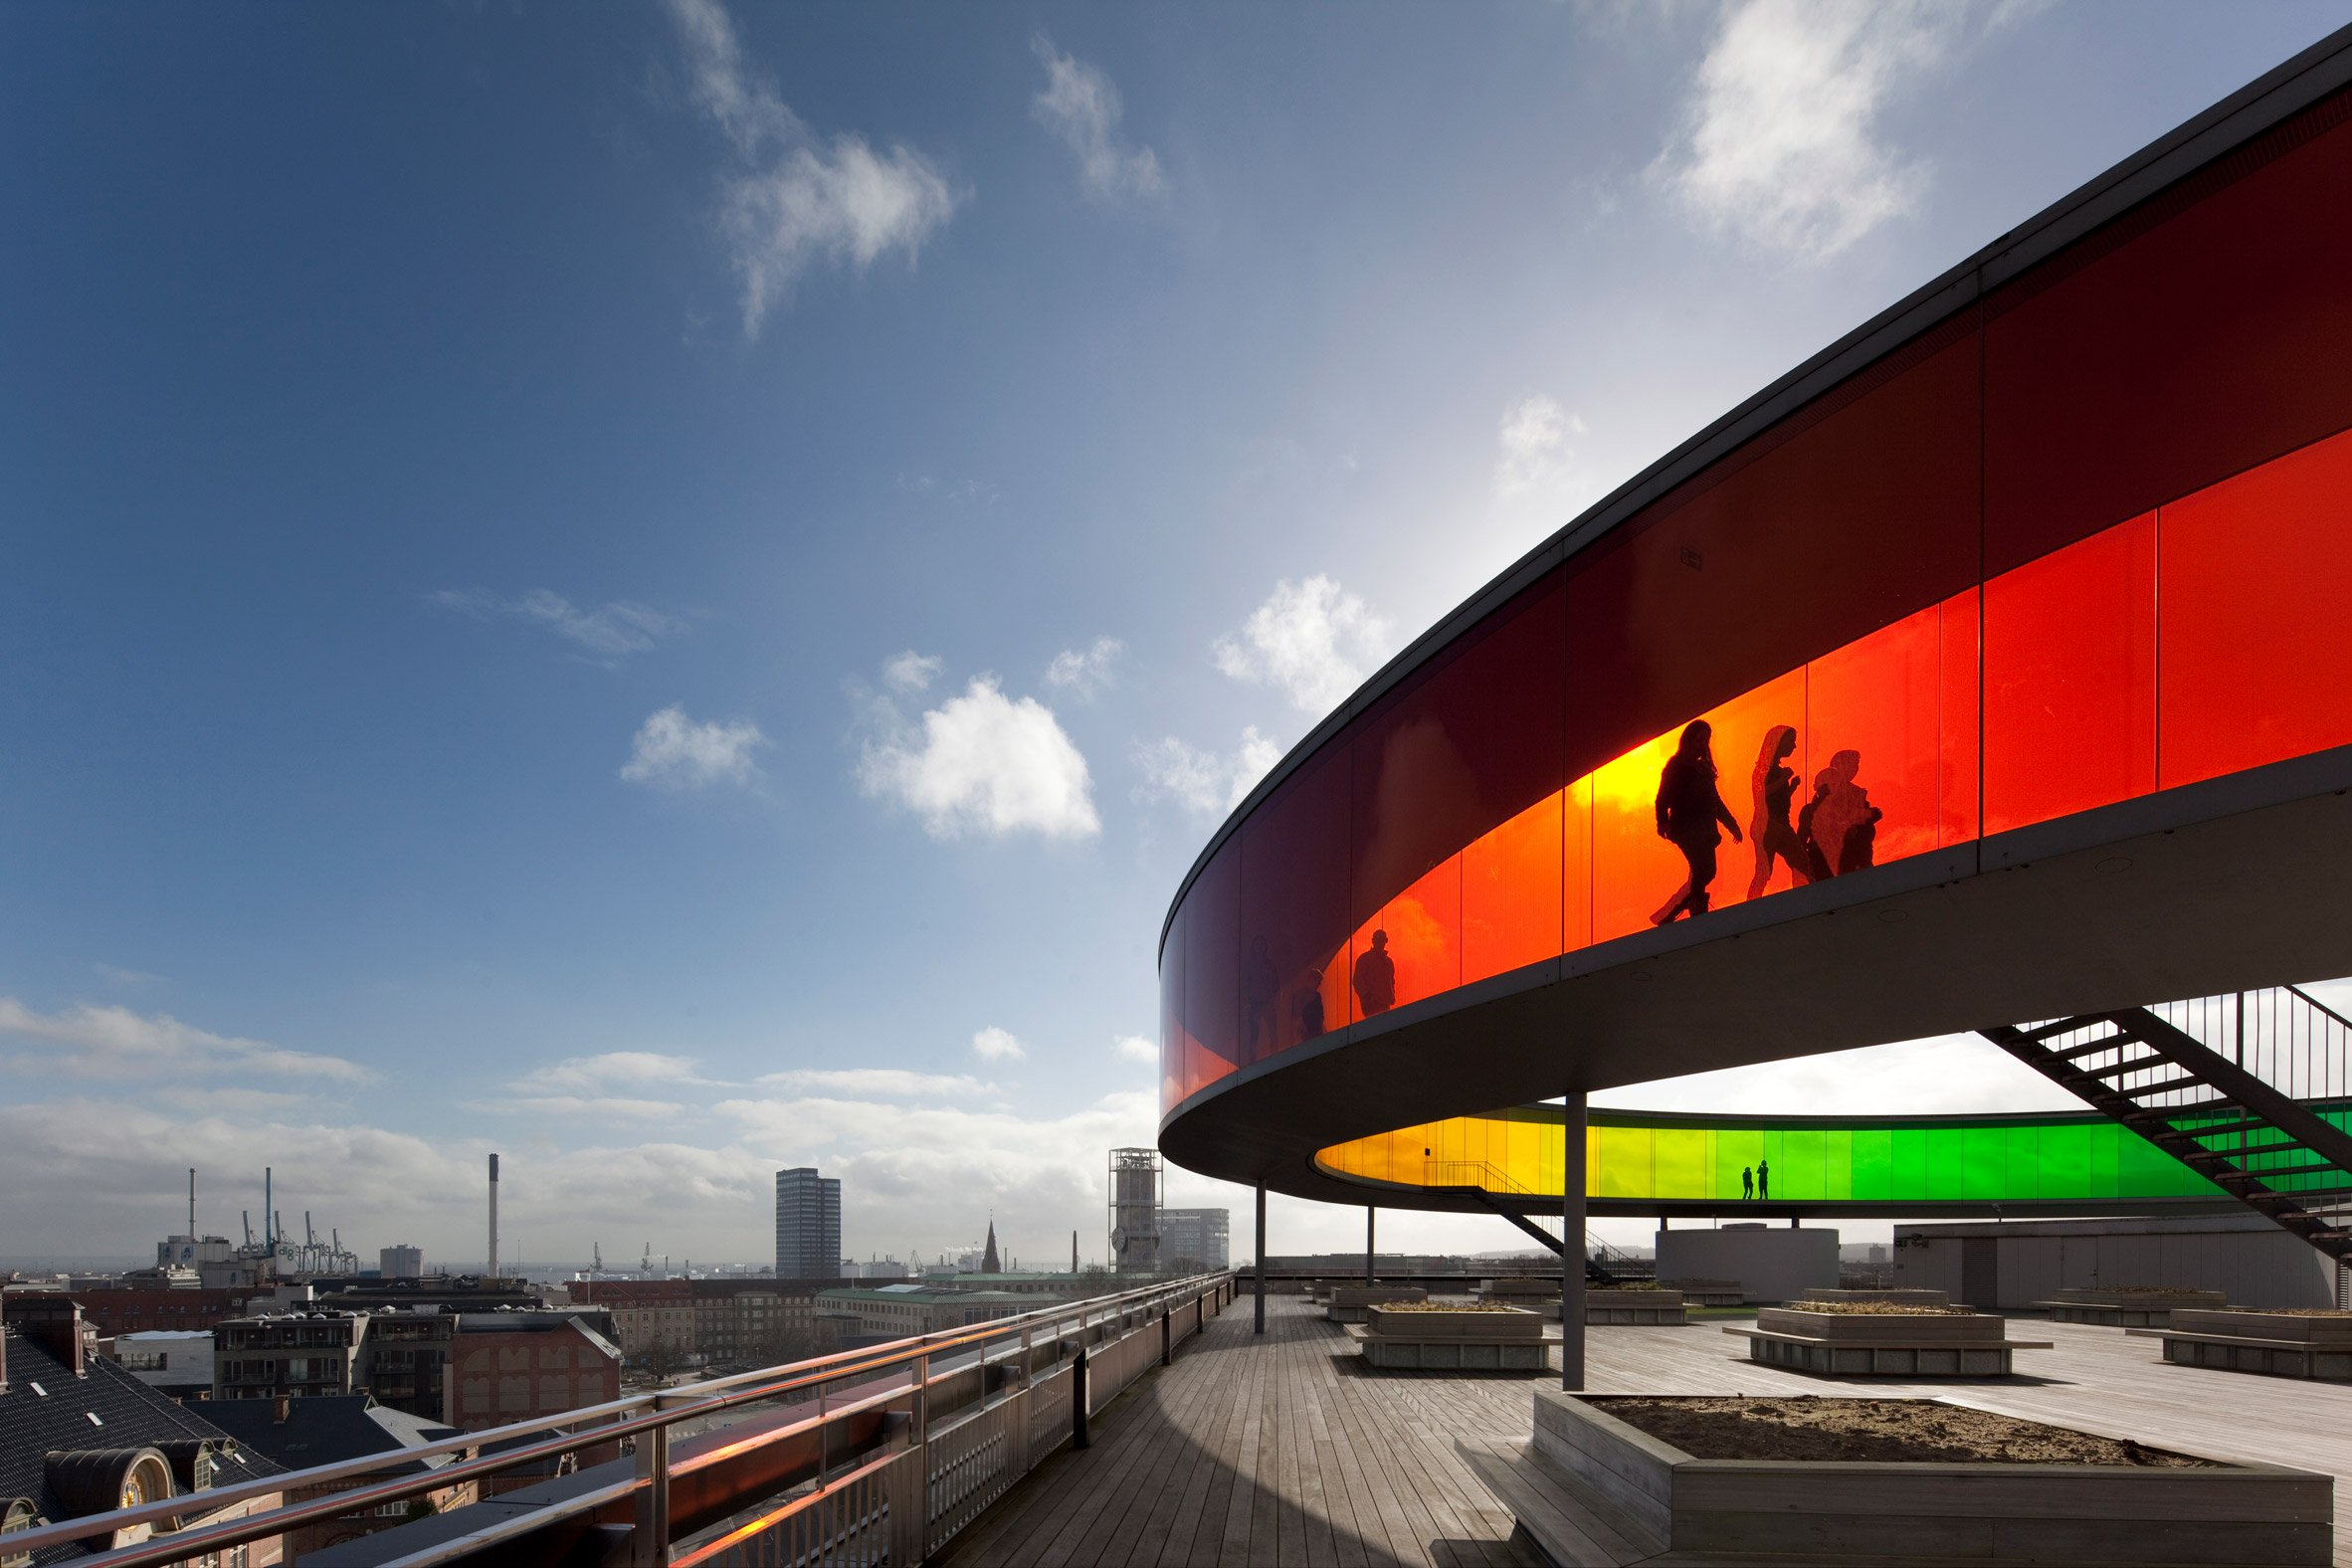 ARoS Aarhus Kunstmuseum, Denmark, by Schmidt Hammer Lassen and Olafur Eliasson